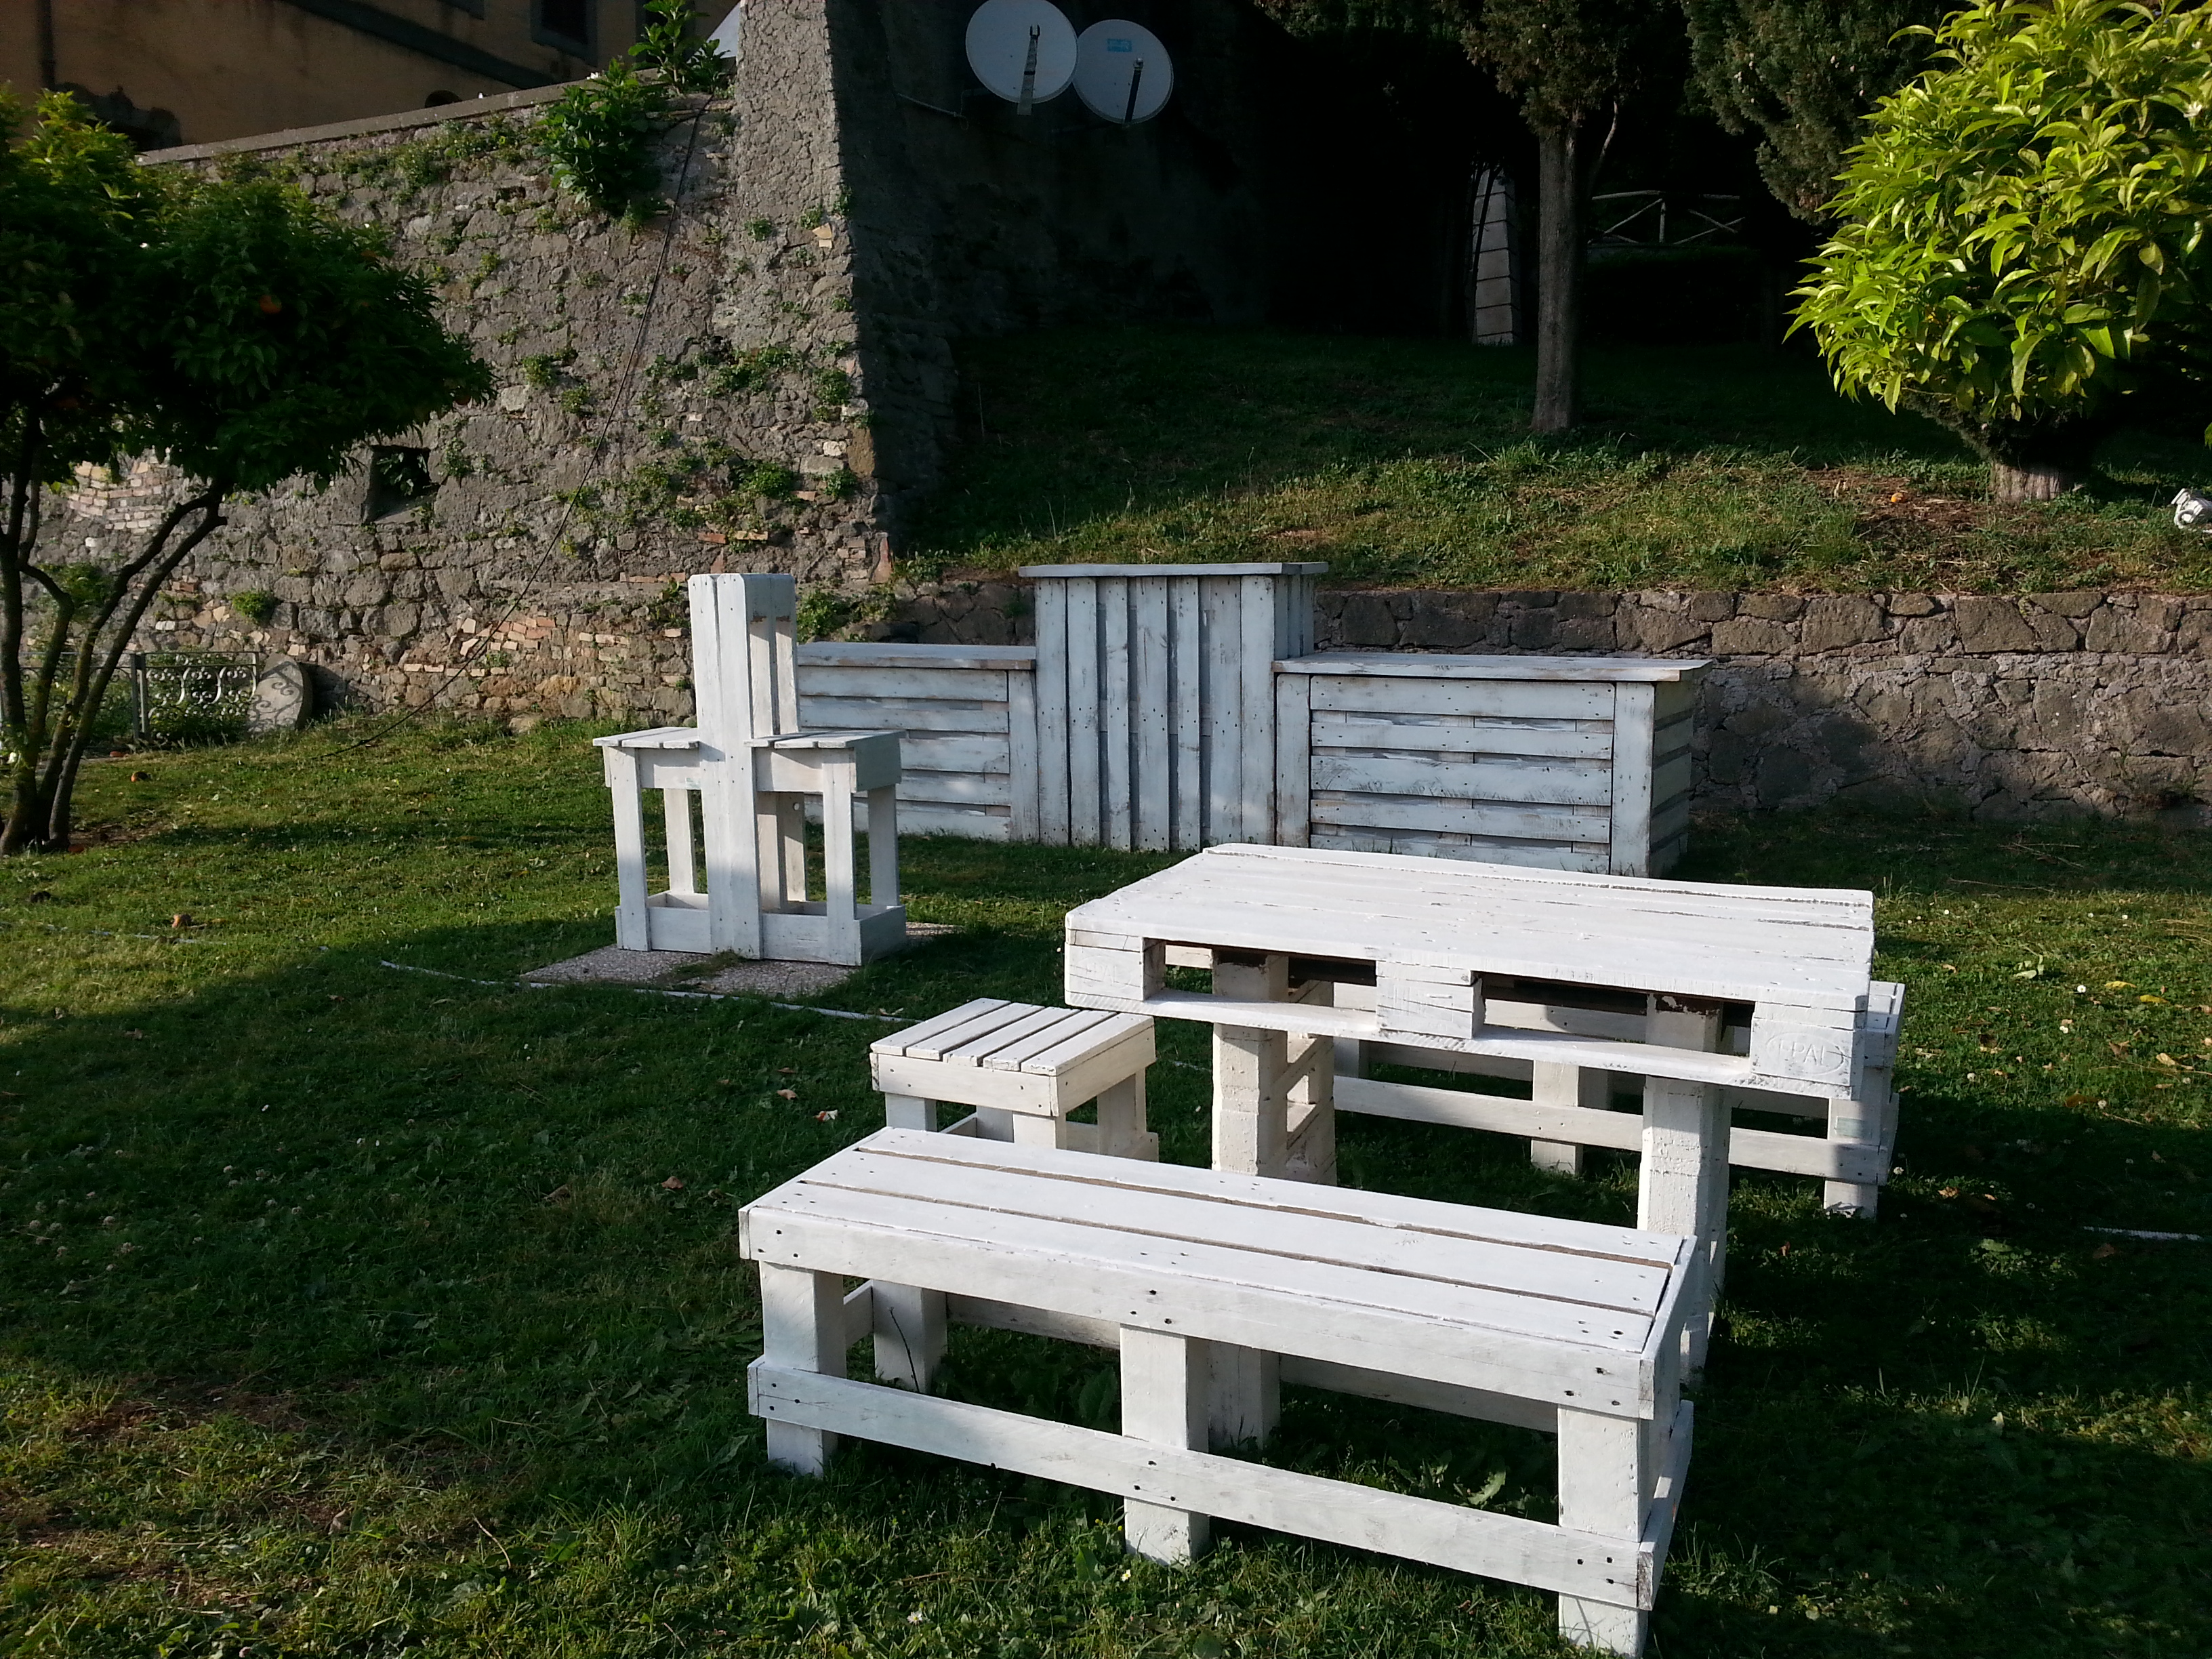 Arredo giardino in pallet archivi mobili in pallet - Giardino pallet ...